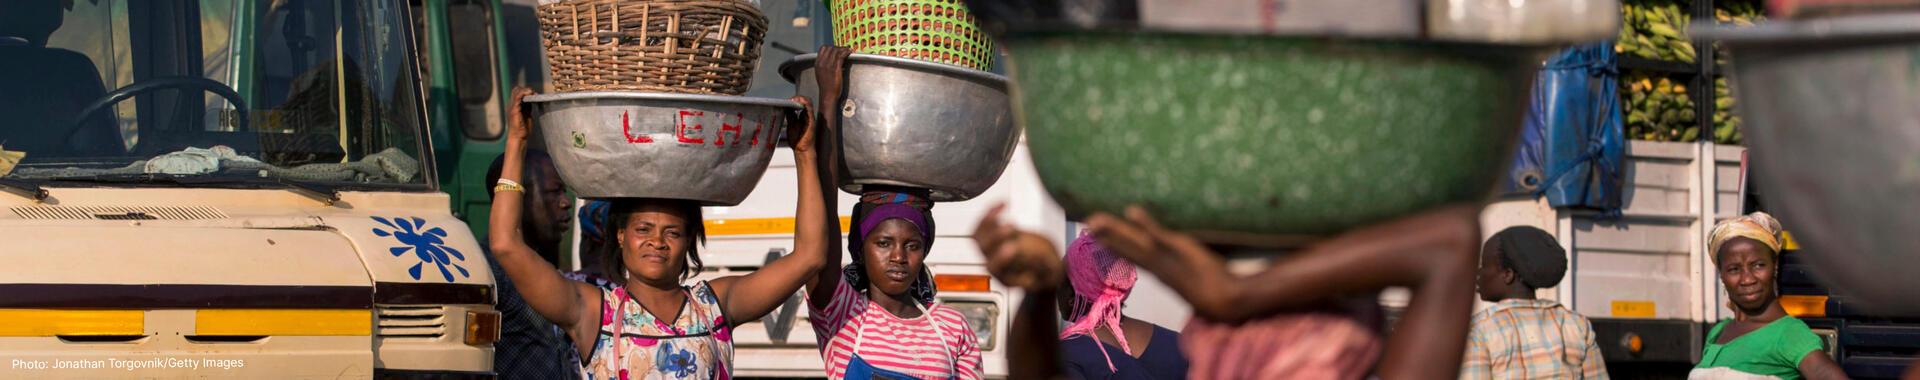 Jonathan Torgovnik_Getty Images_Images of Empowerment